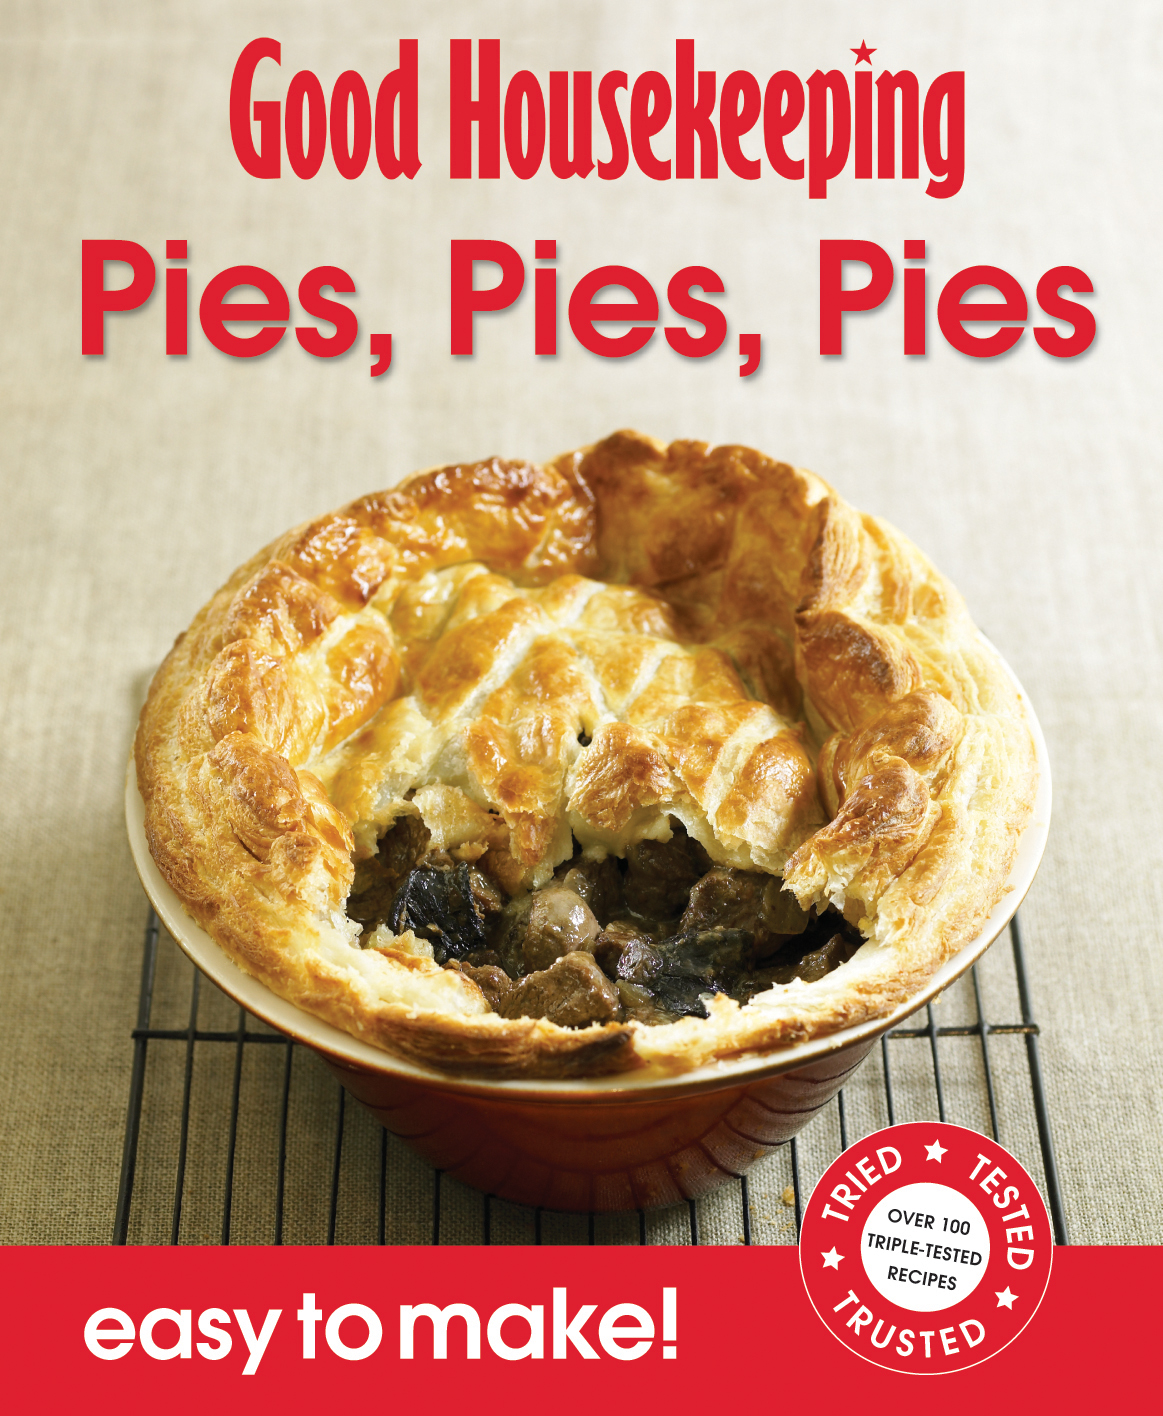 Good Housekeeping Easy to Make! Pies, Pies, Pies